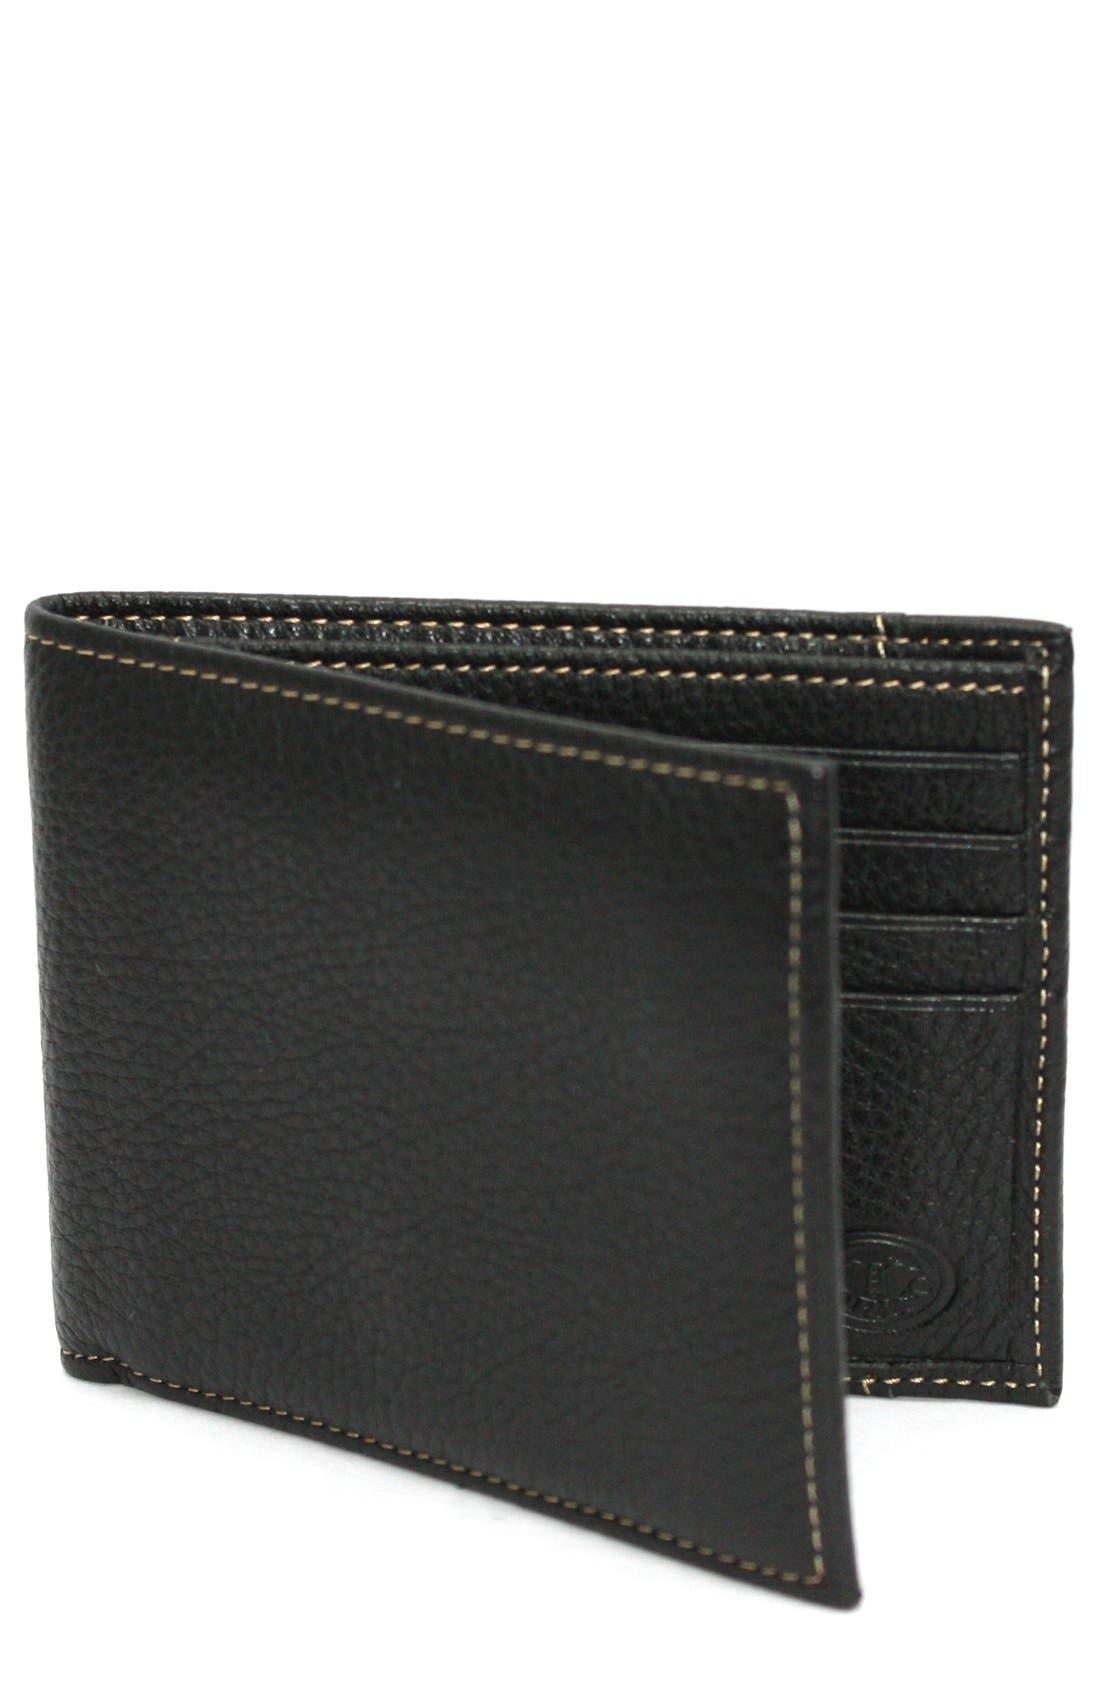 Main Image - Torino Belts Leather Billfold Wallet